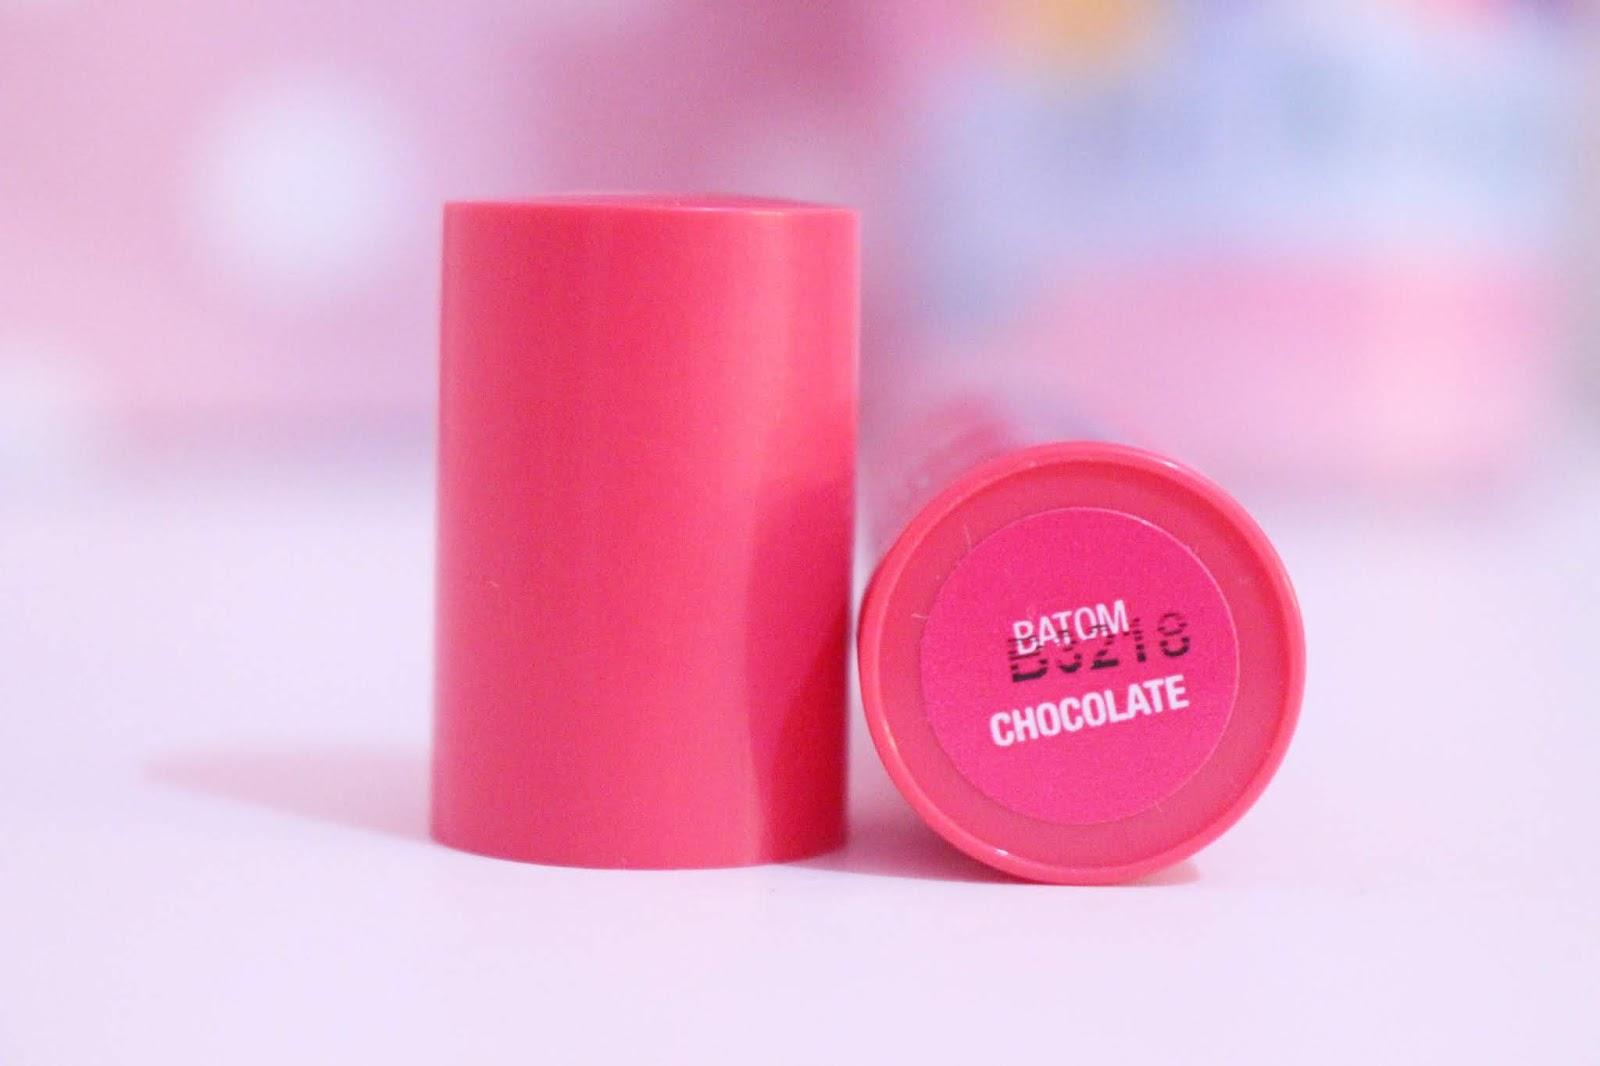 resenha-batom-chocolate-avon-colortrend #5